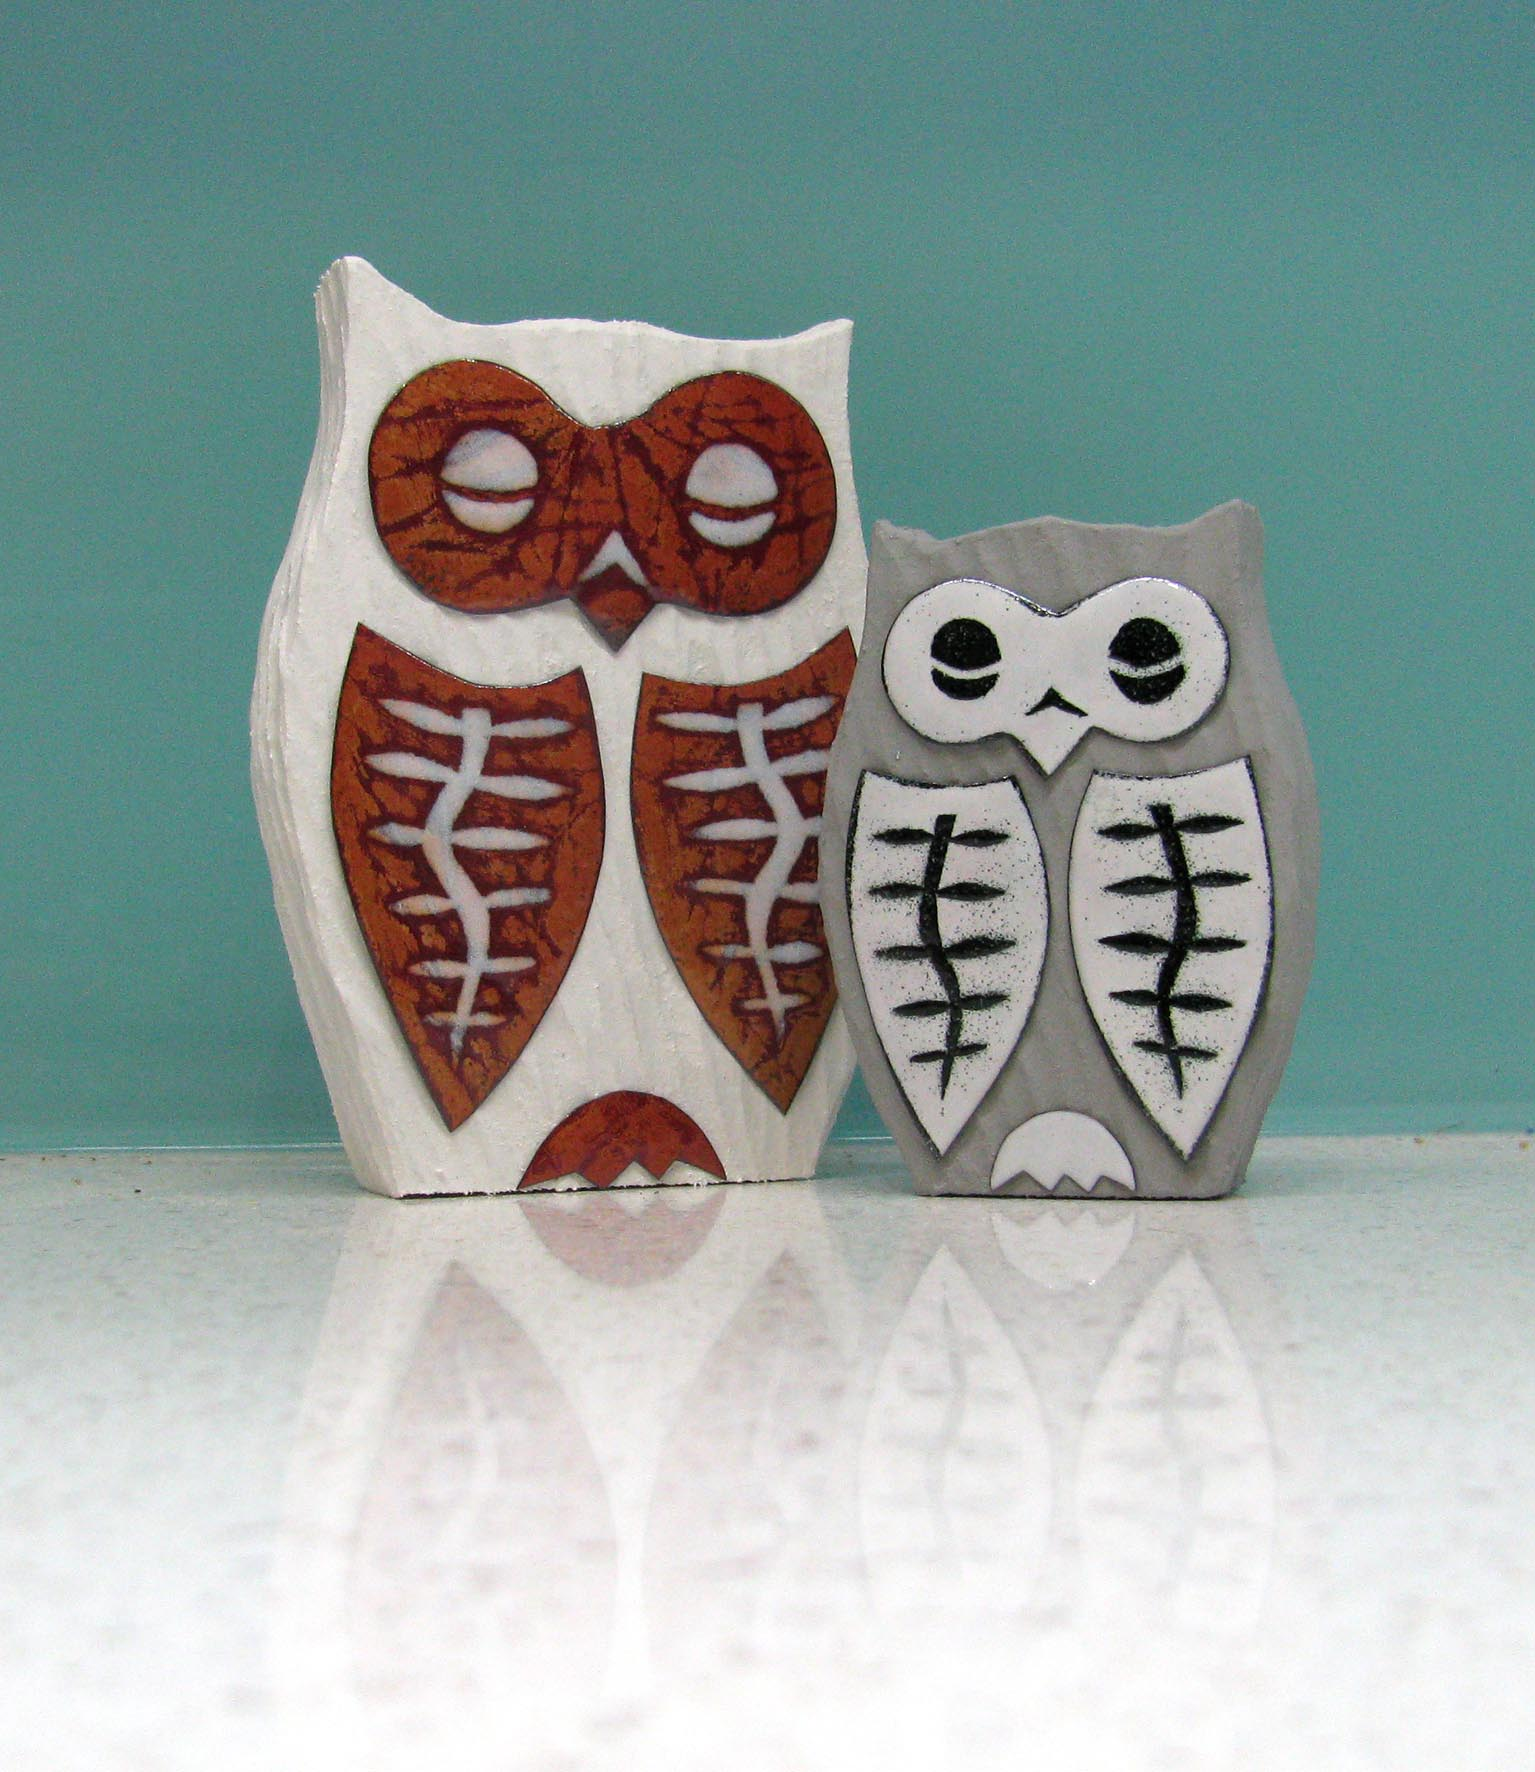 Carved owls with enamel details